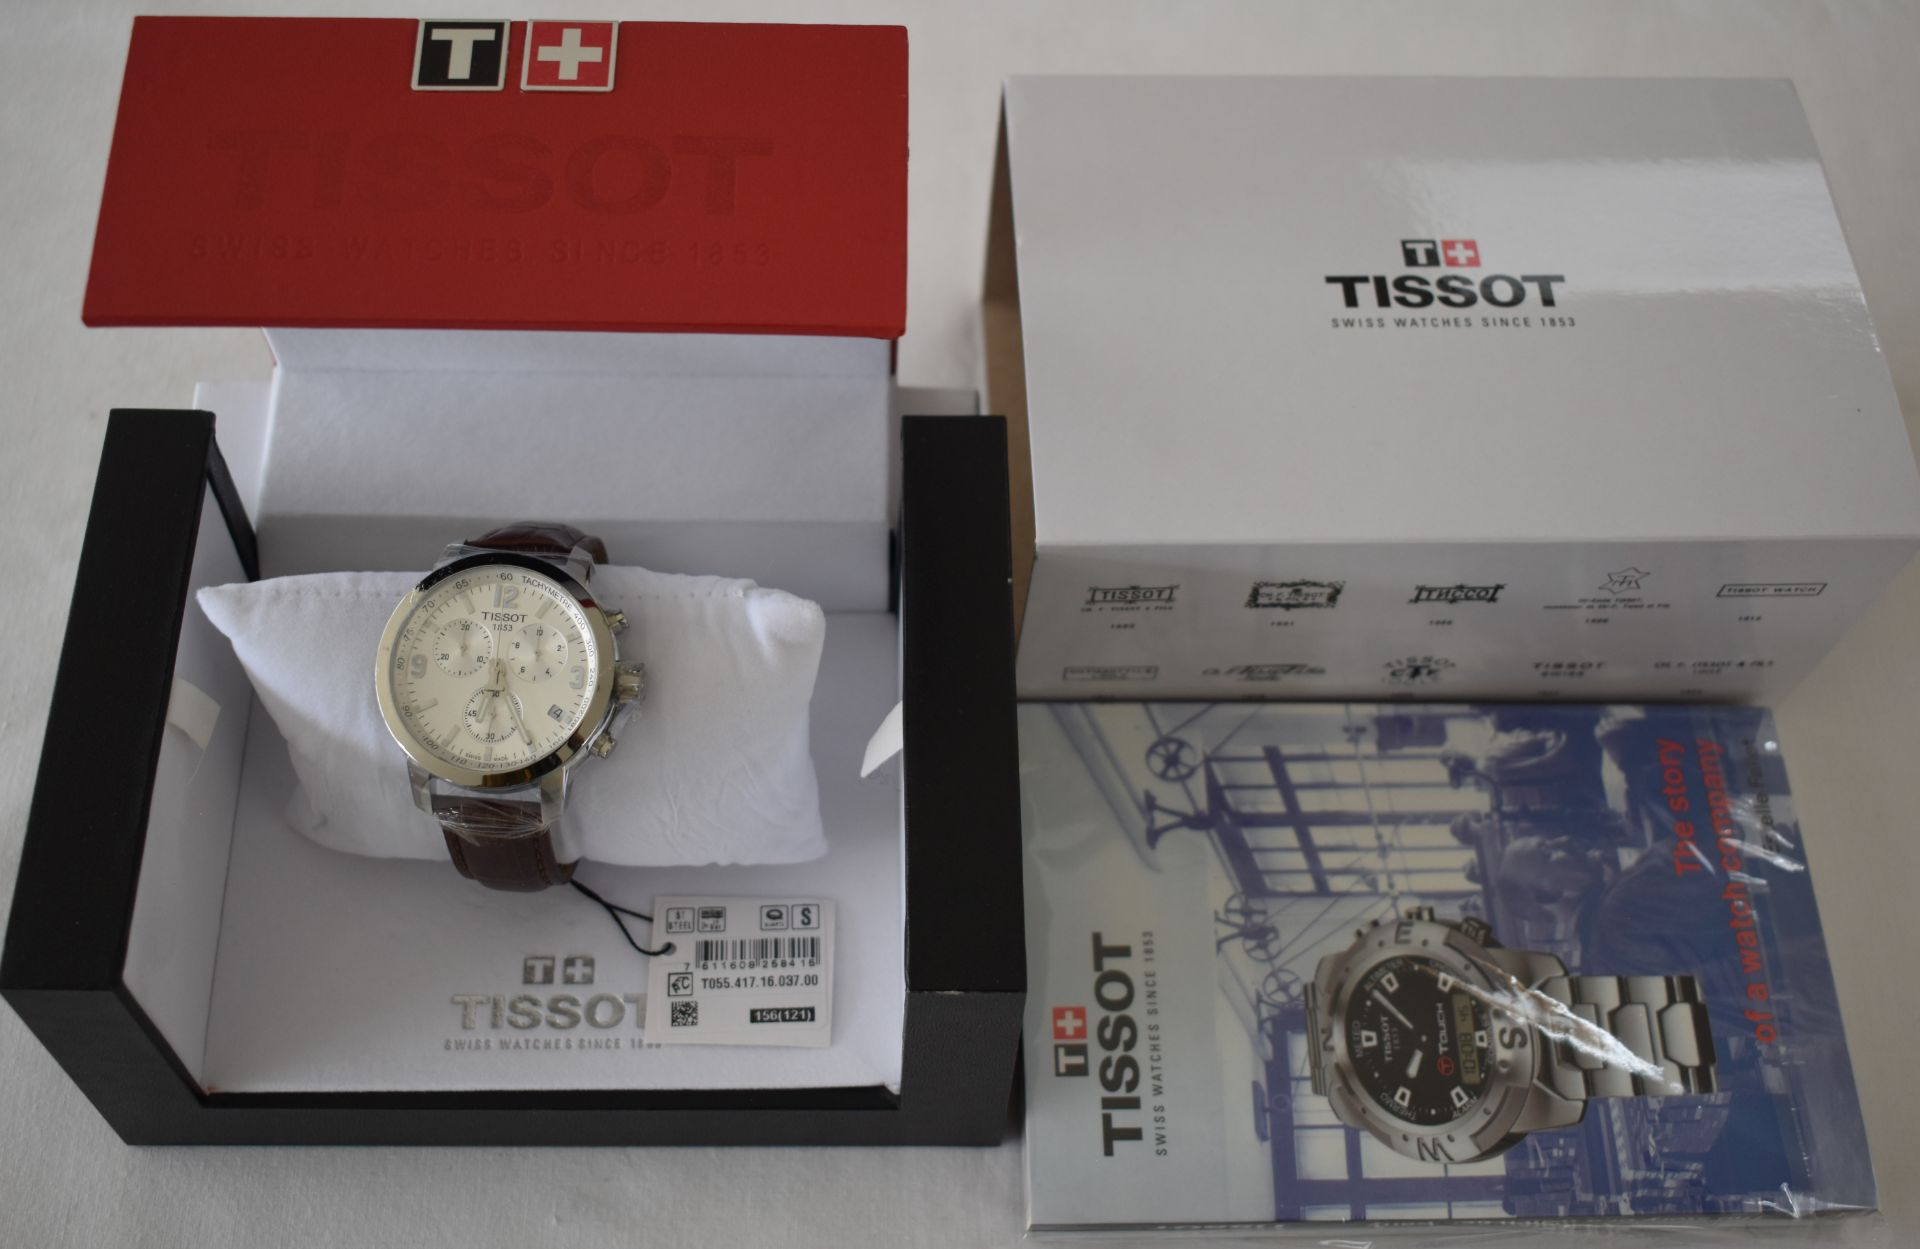 Tissot Men's Watch TO55.417.16.037.00 - Image 3 of 3